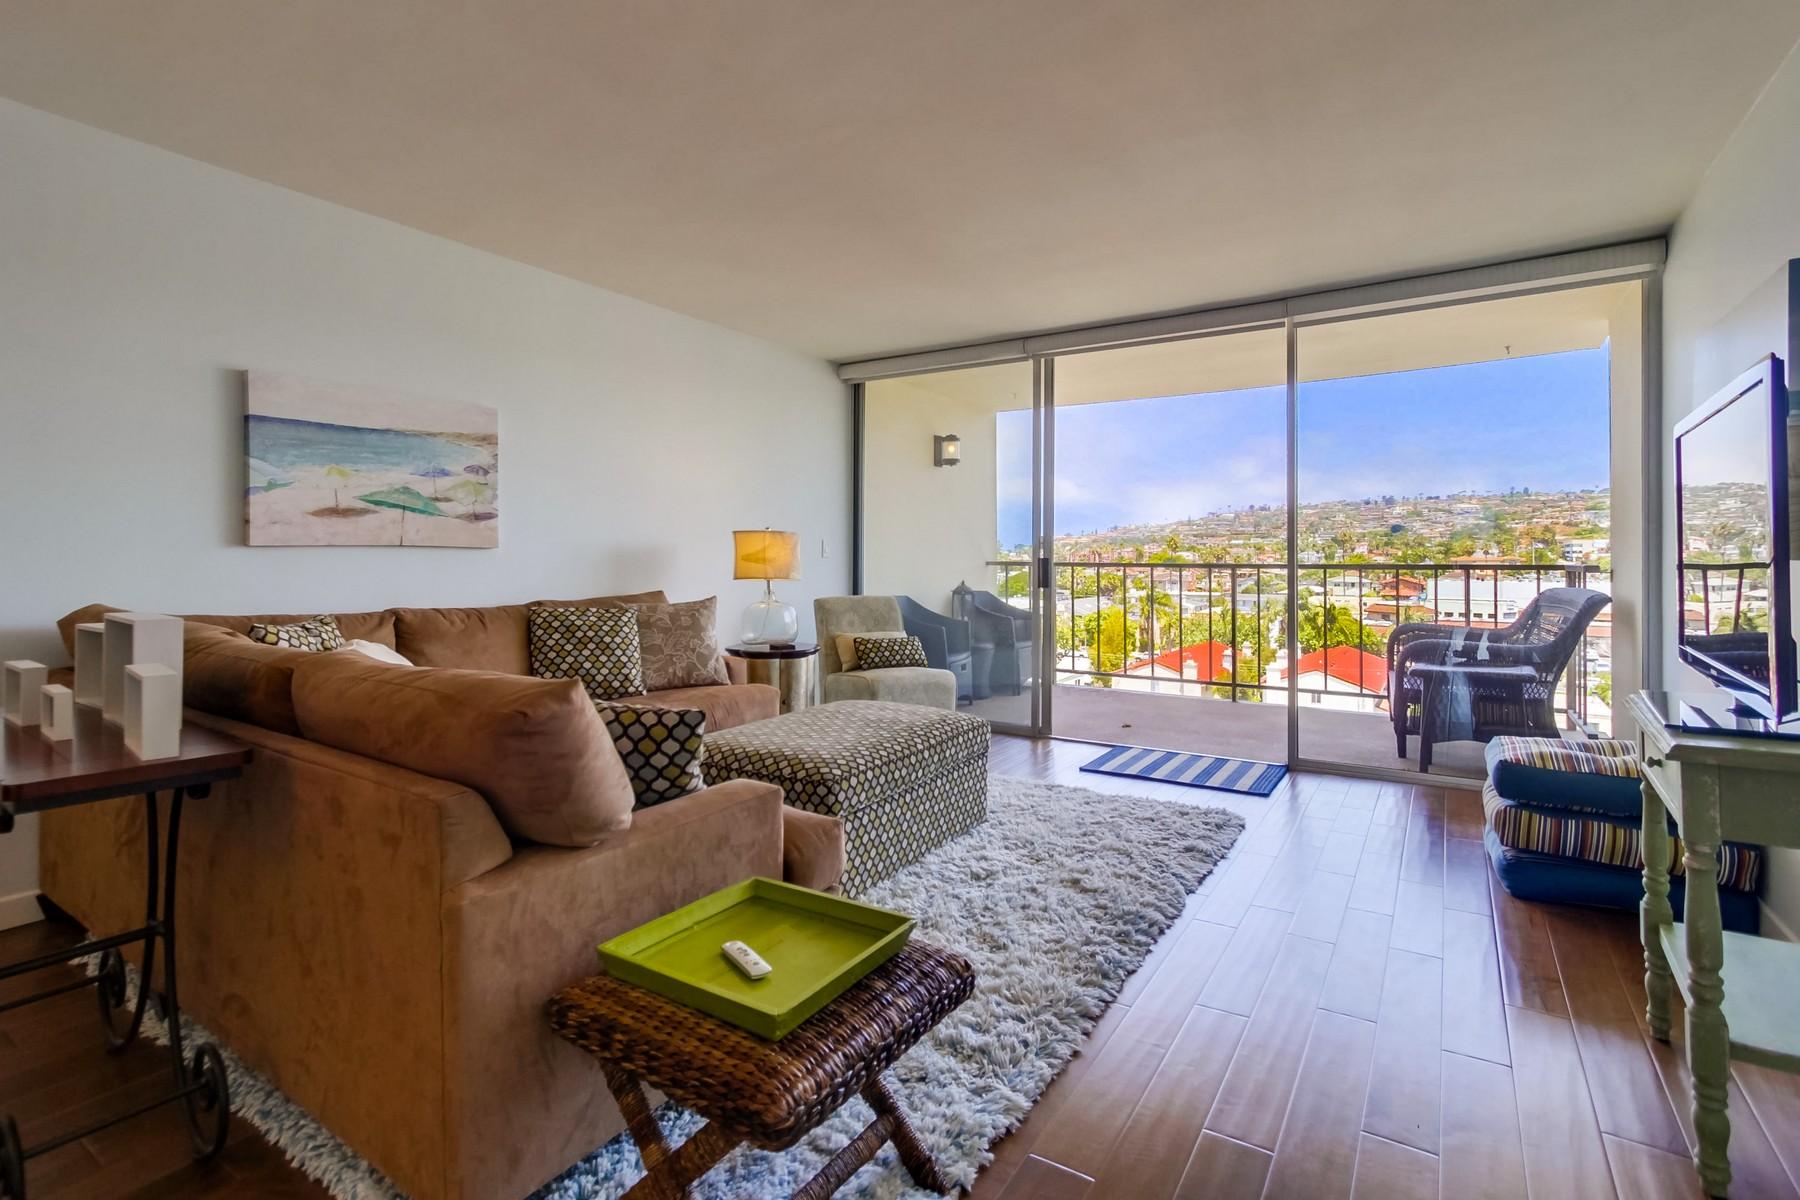 Condominium for Rent at 4944 Cass #804 4944 Cass #804 San Diego, California 92109 United States